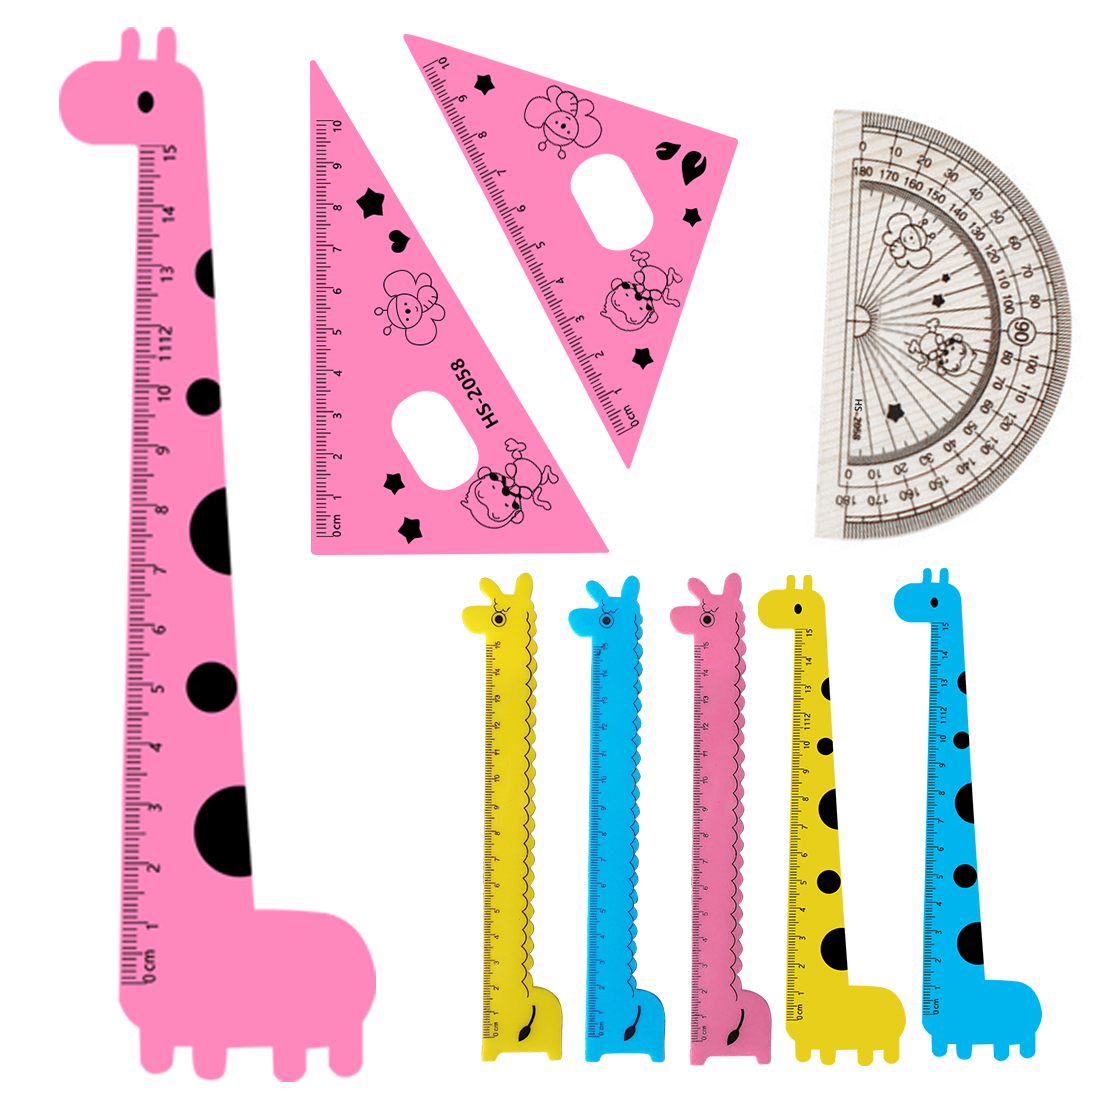 FangNymph Cute Cartoon Giraffe Pattern Student Set Ruler Student Kids Drafting Stencil Ruler Stationery 4PCS Yellow